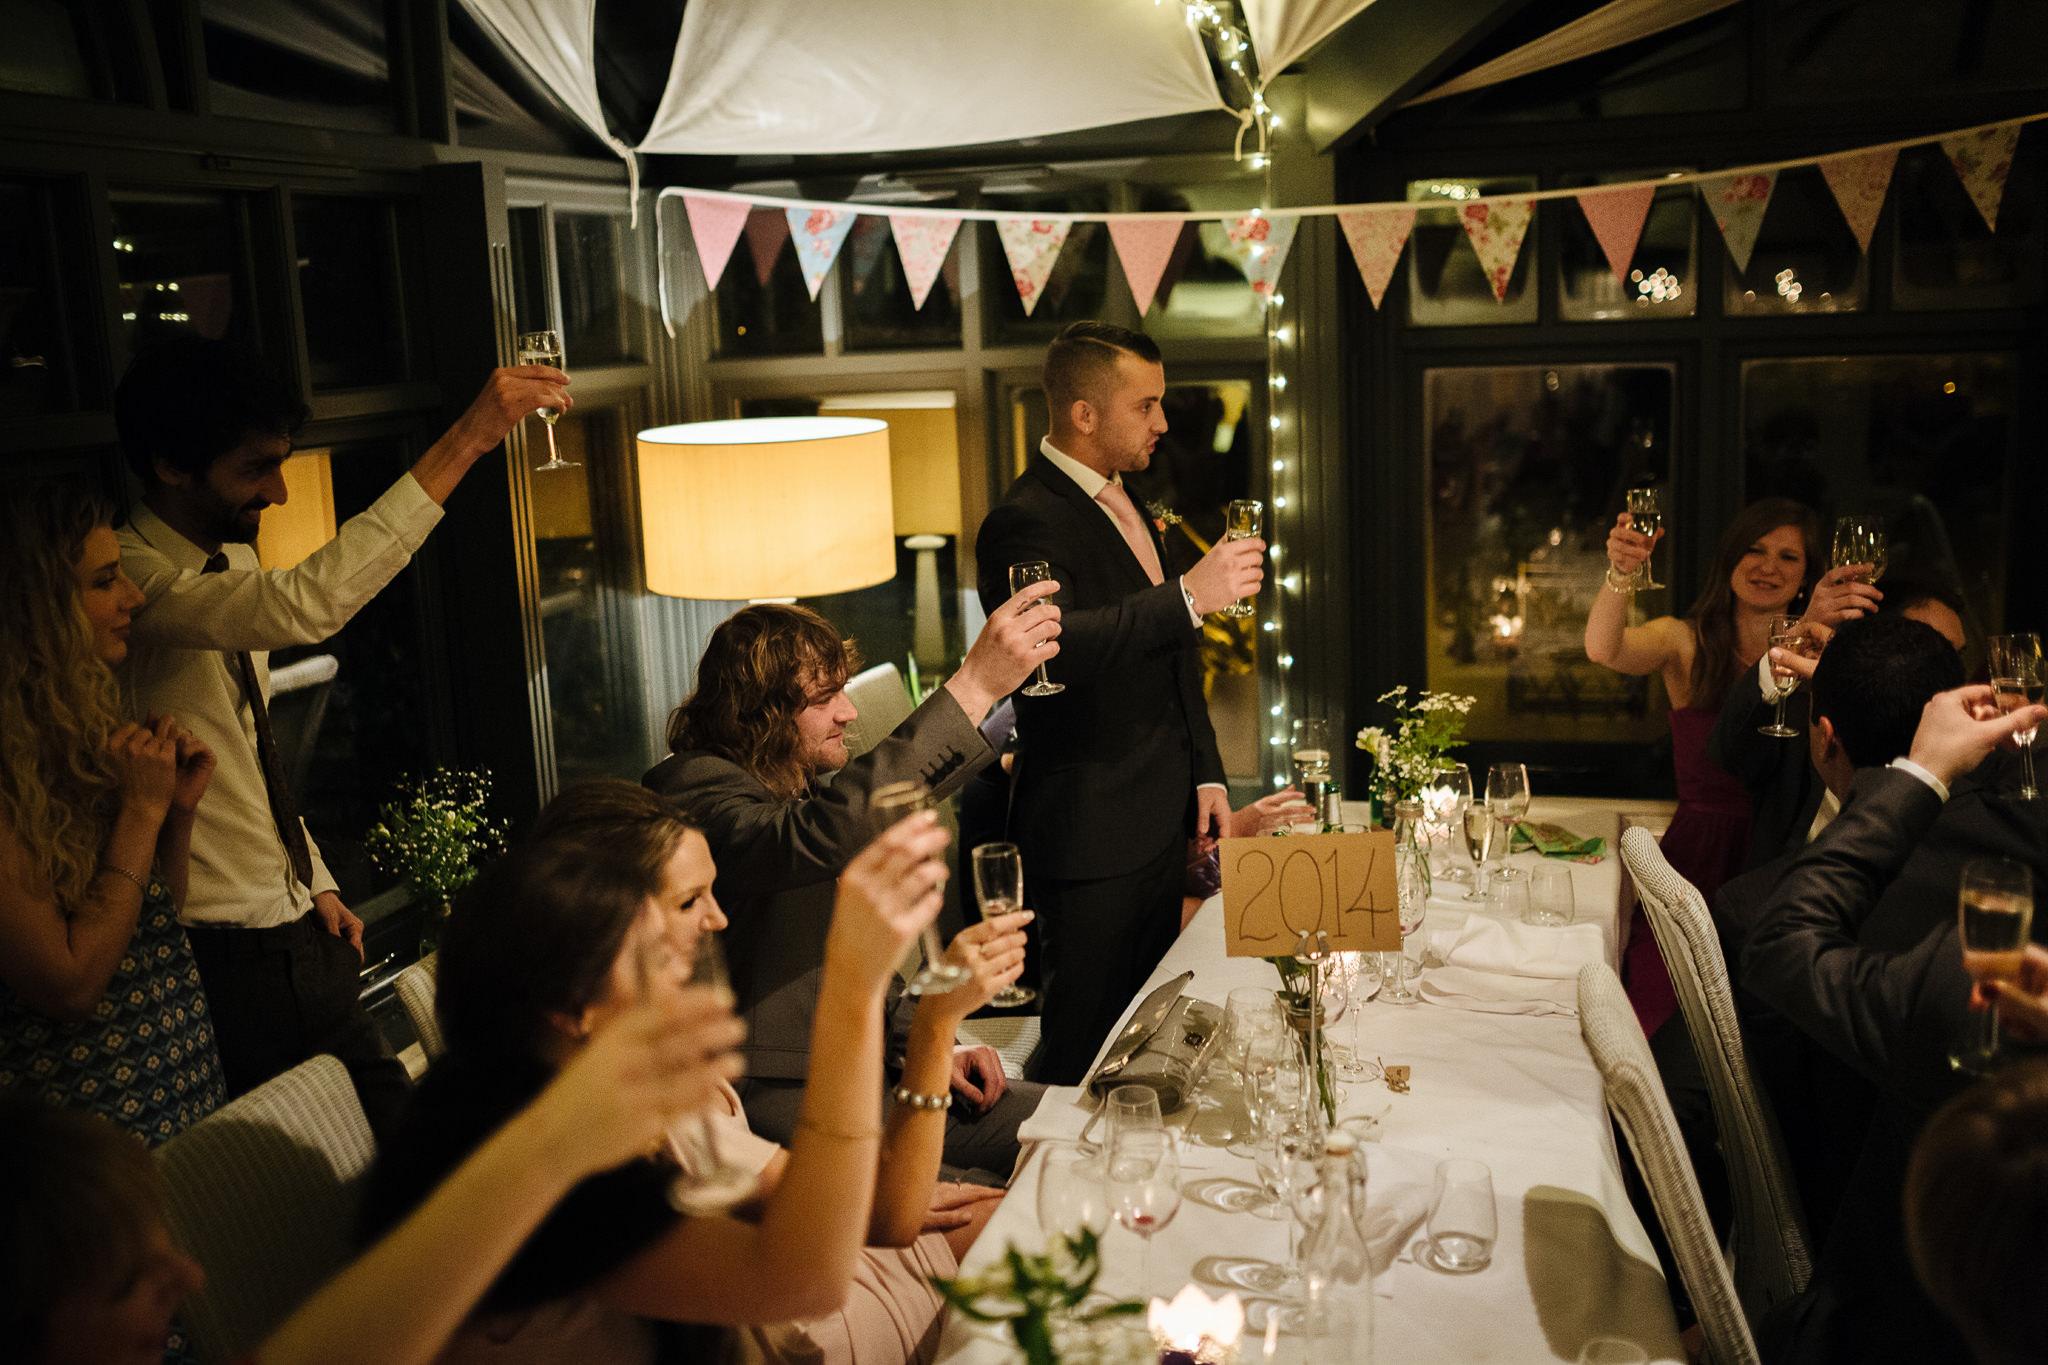 Creative-reportage-wedding-photography-90040